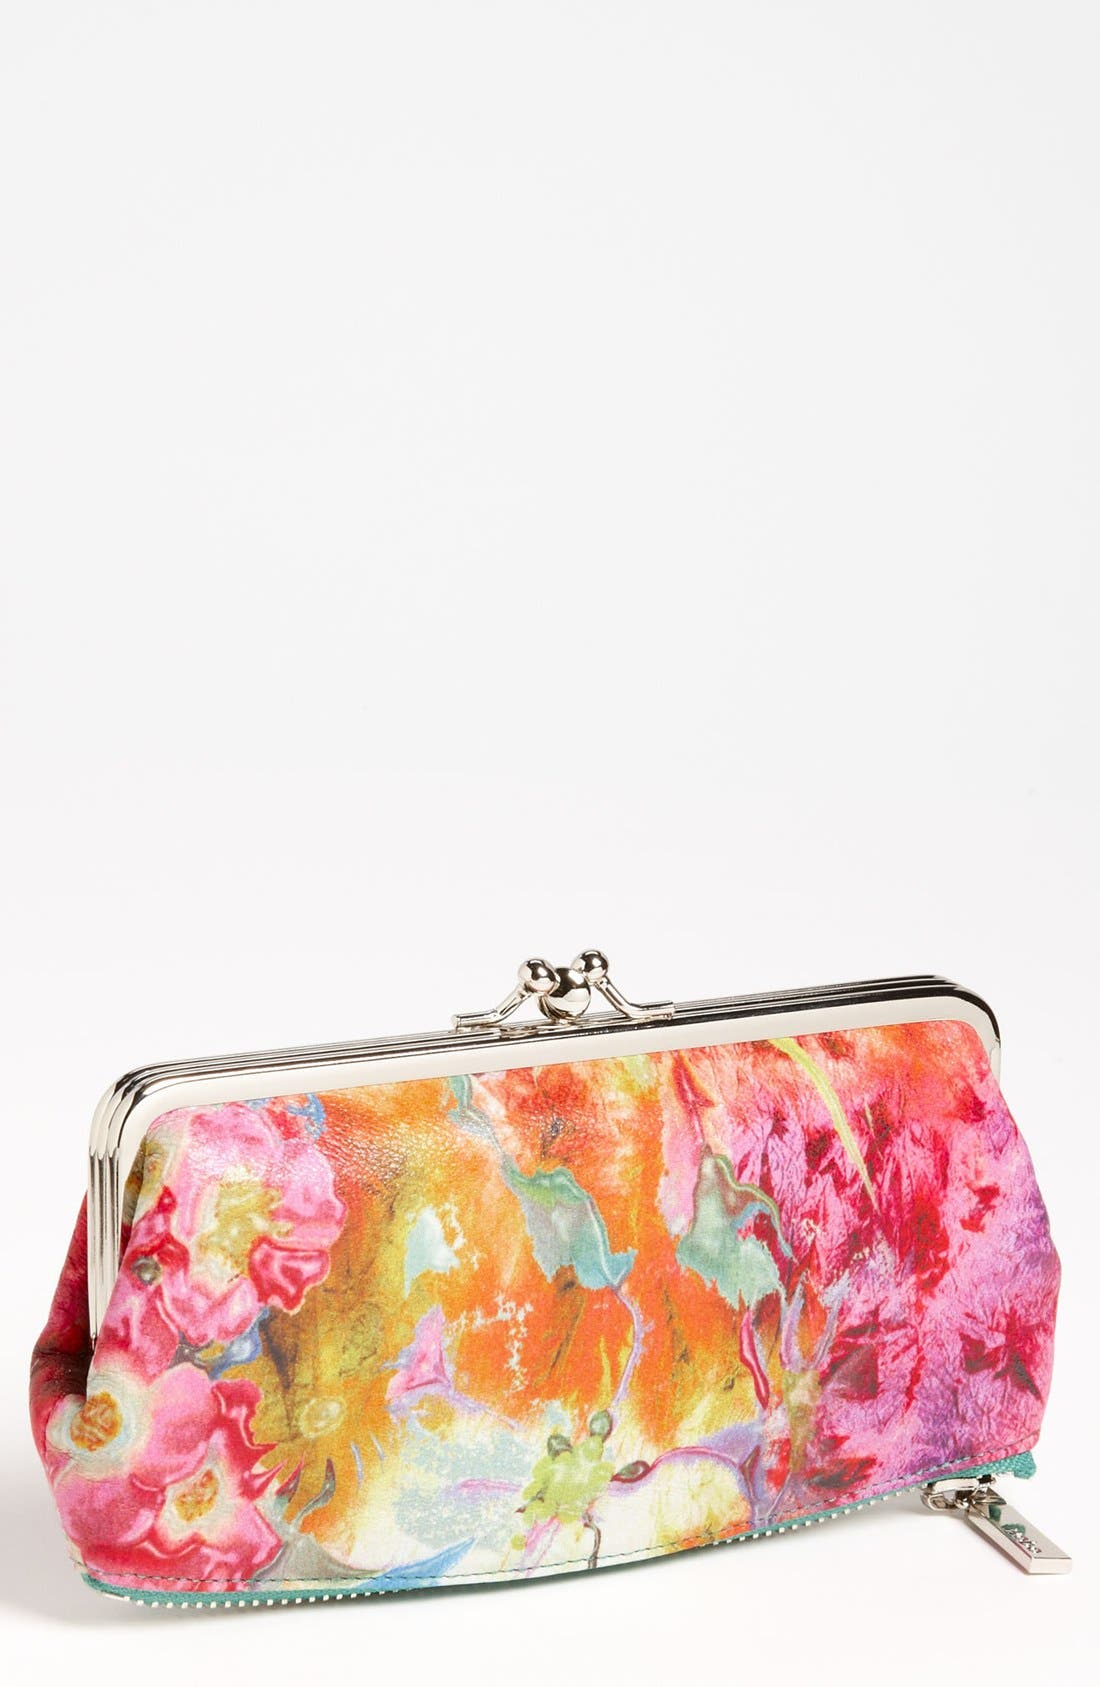 Alternate Image 1 Selected - Hobo 'Vintage Millie' Kisslock Clutch Wallet